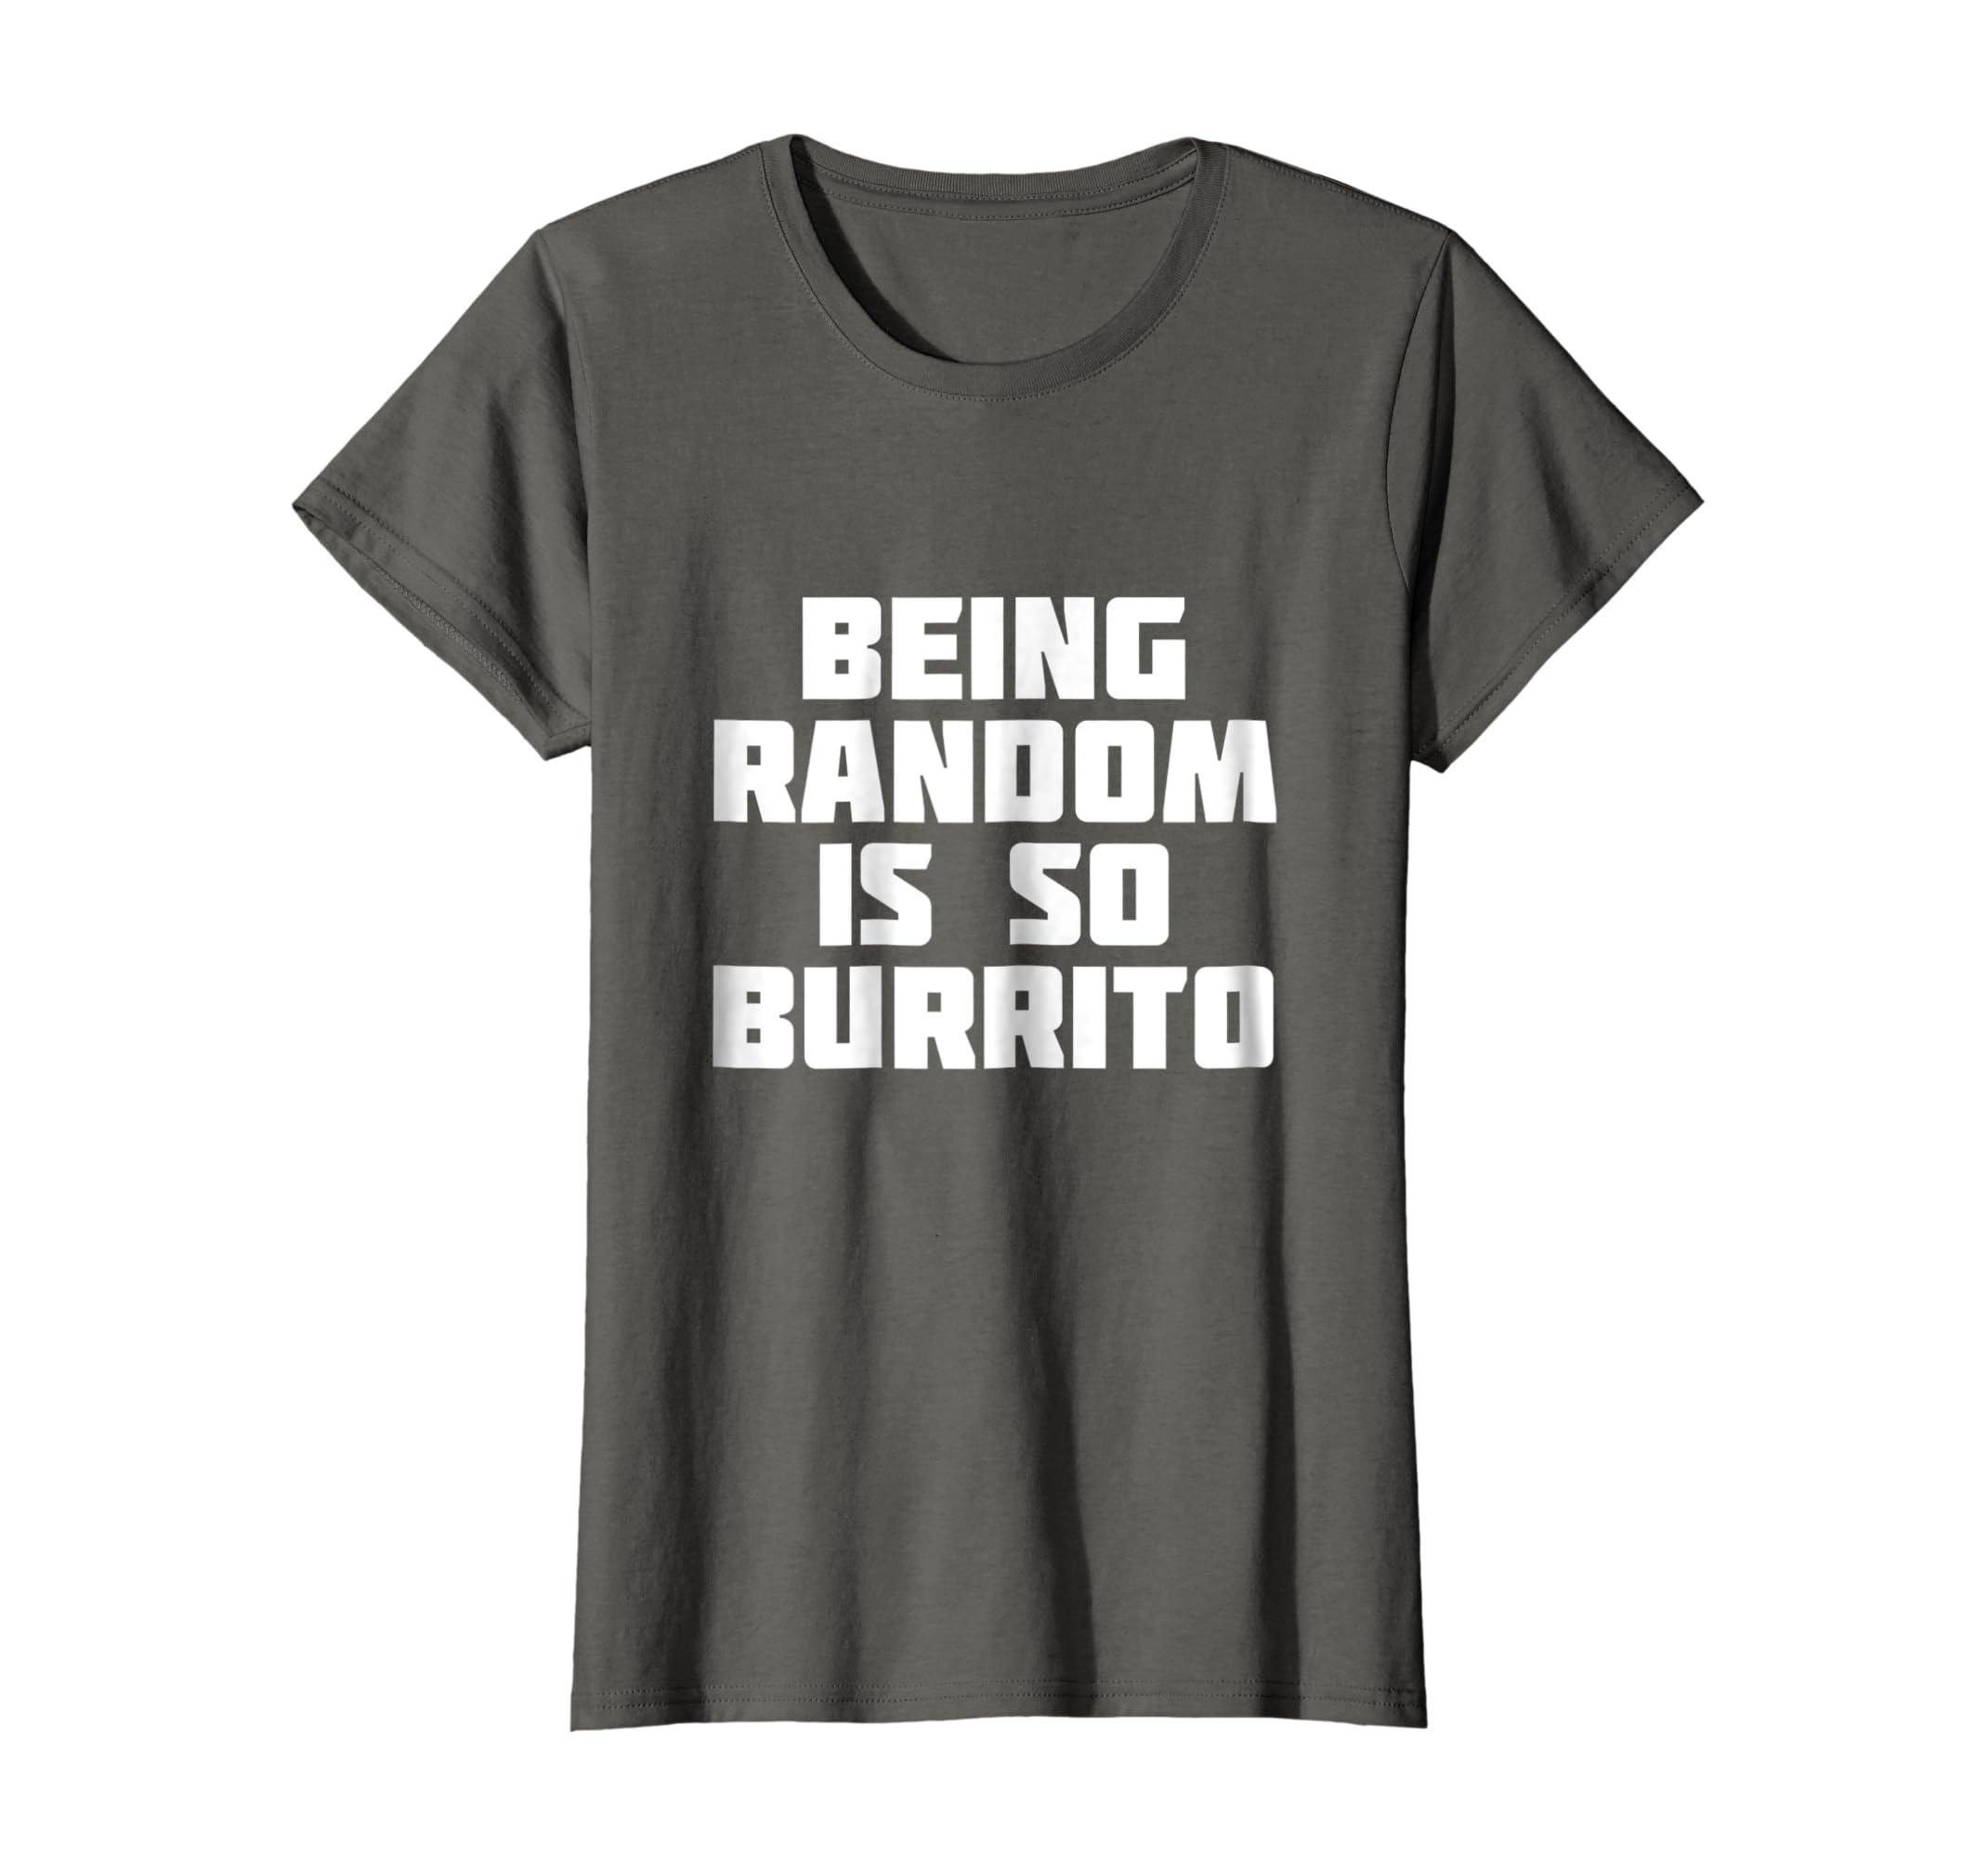 fbe21fe2d Amazon.com: Being Random Is So Burrito | Funny Sarcastic T-Shirt: Clothing